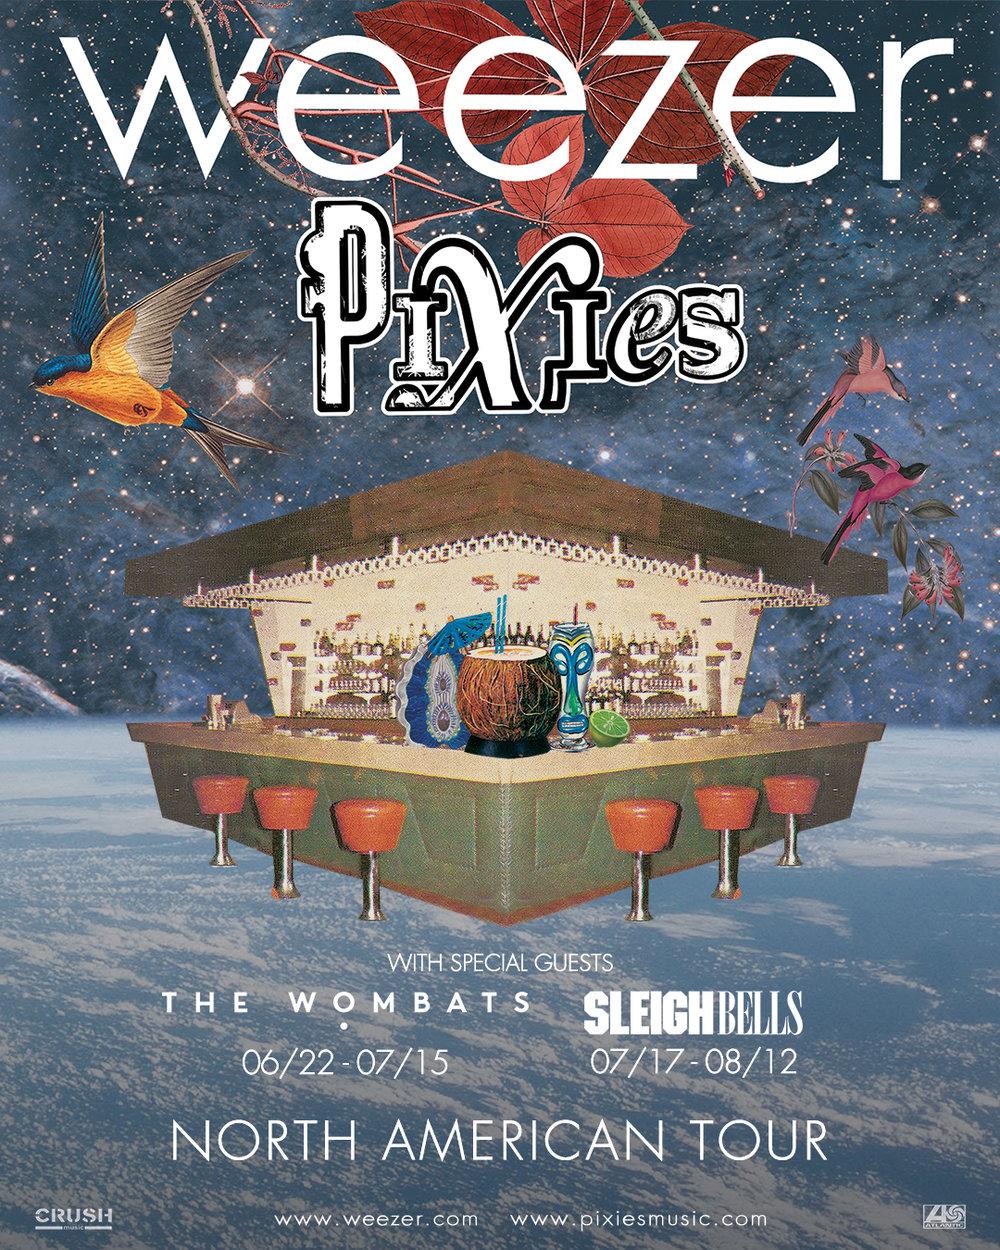 Weezer_Pixies_sgTW_SB_Facebook_Instagram_Post_1080x1350r_Static (2).jpg